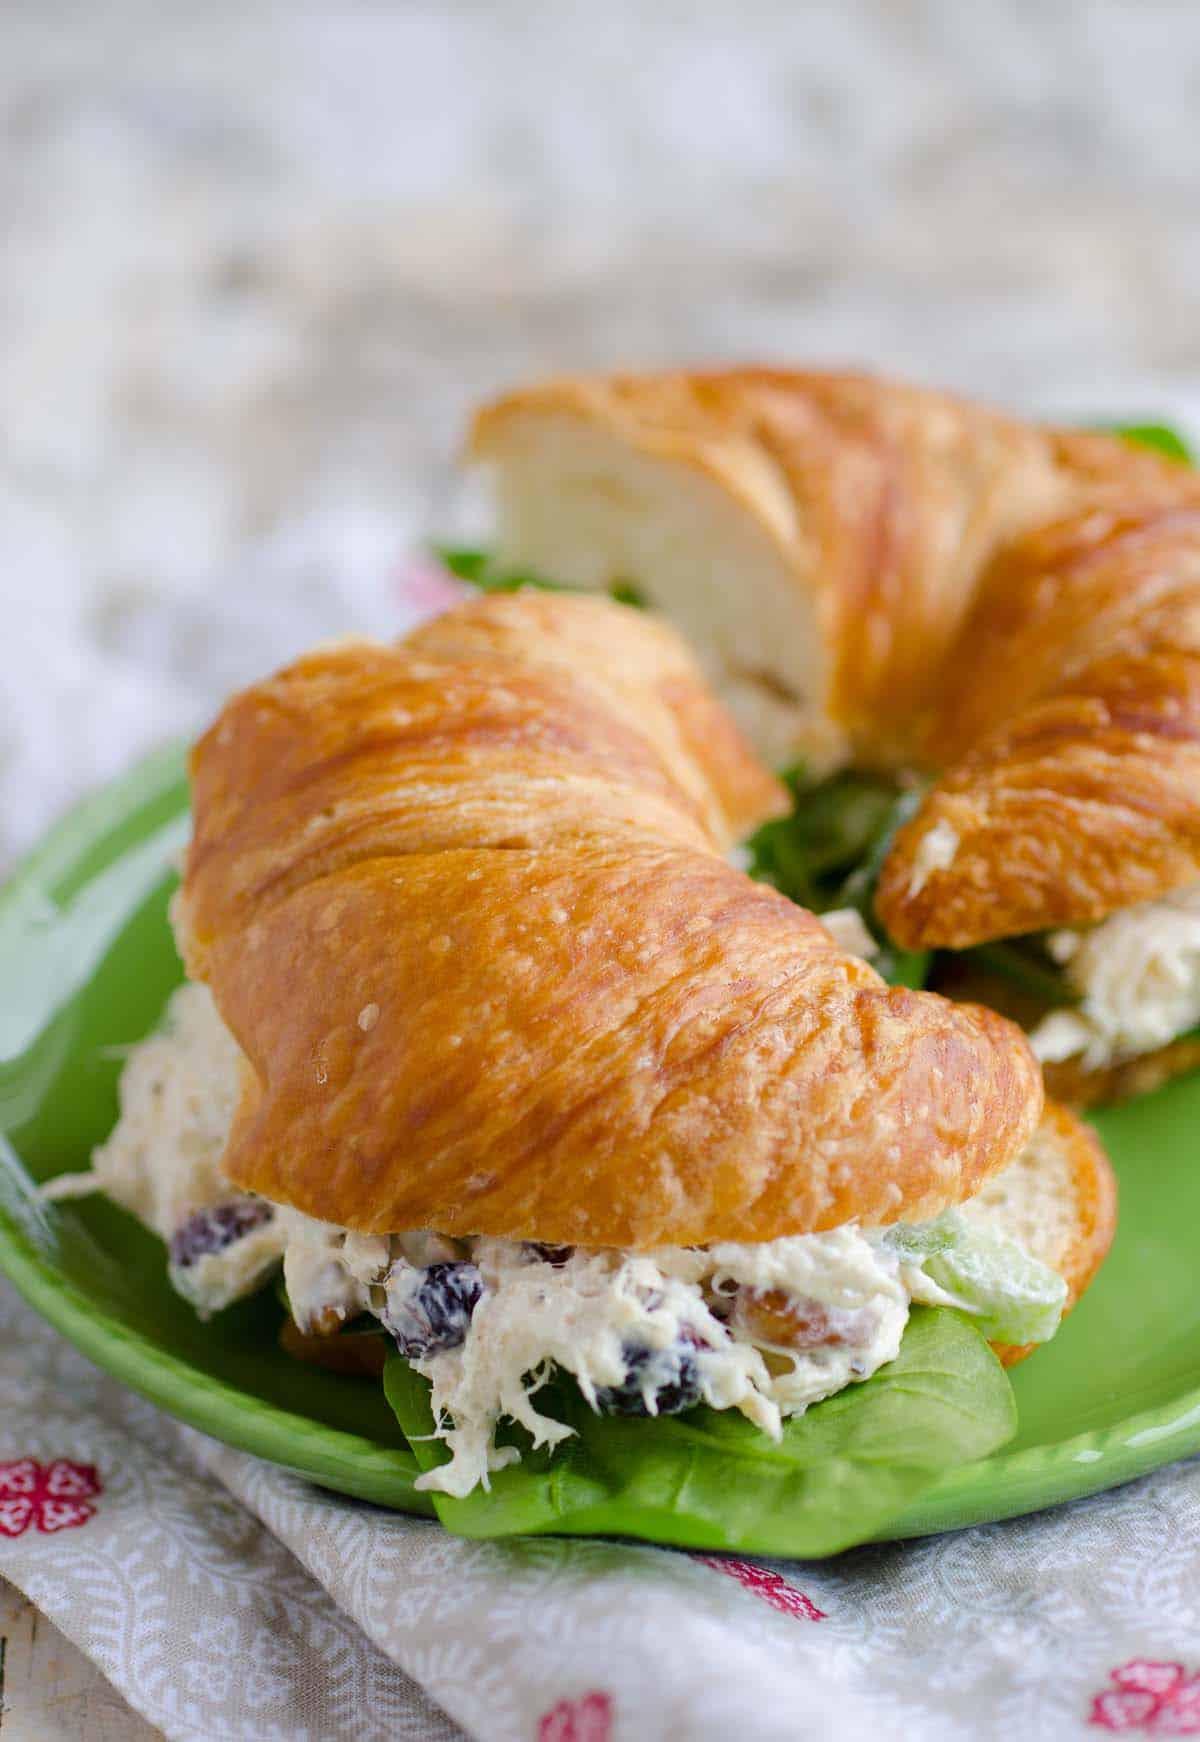 chicken salad on a croissant